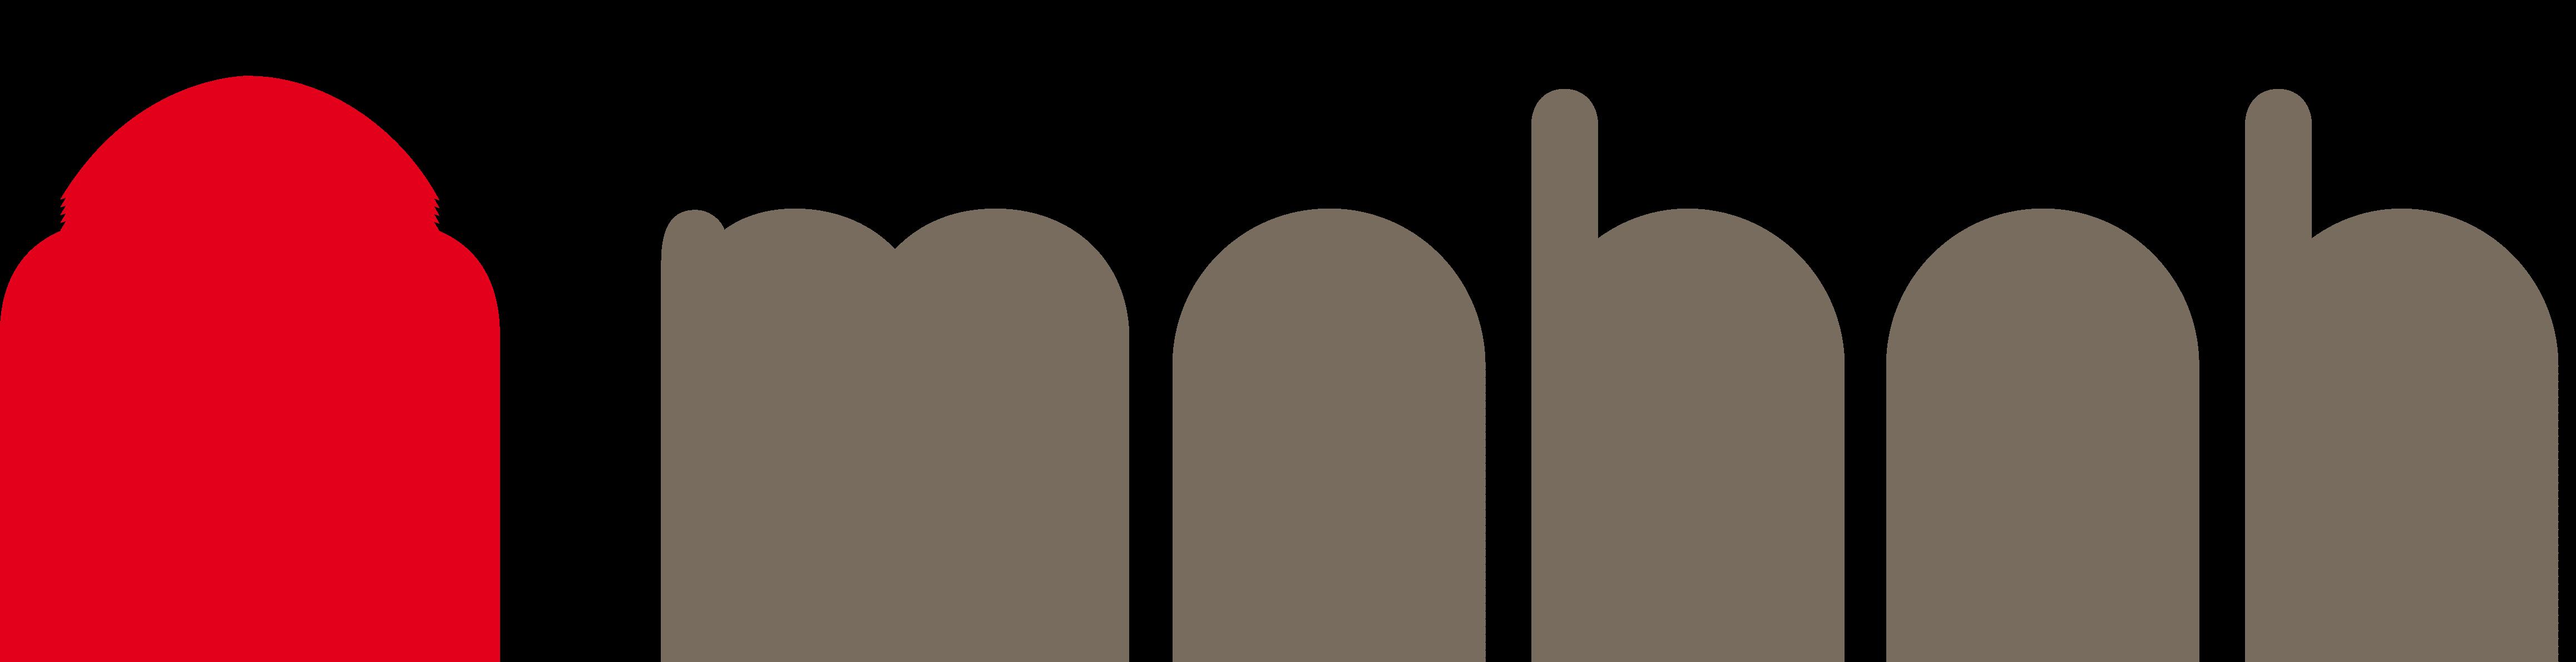 Mobob GbR